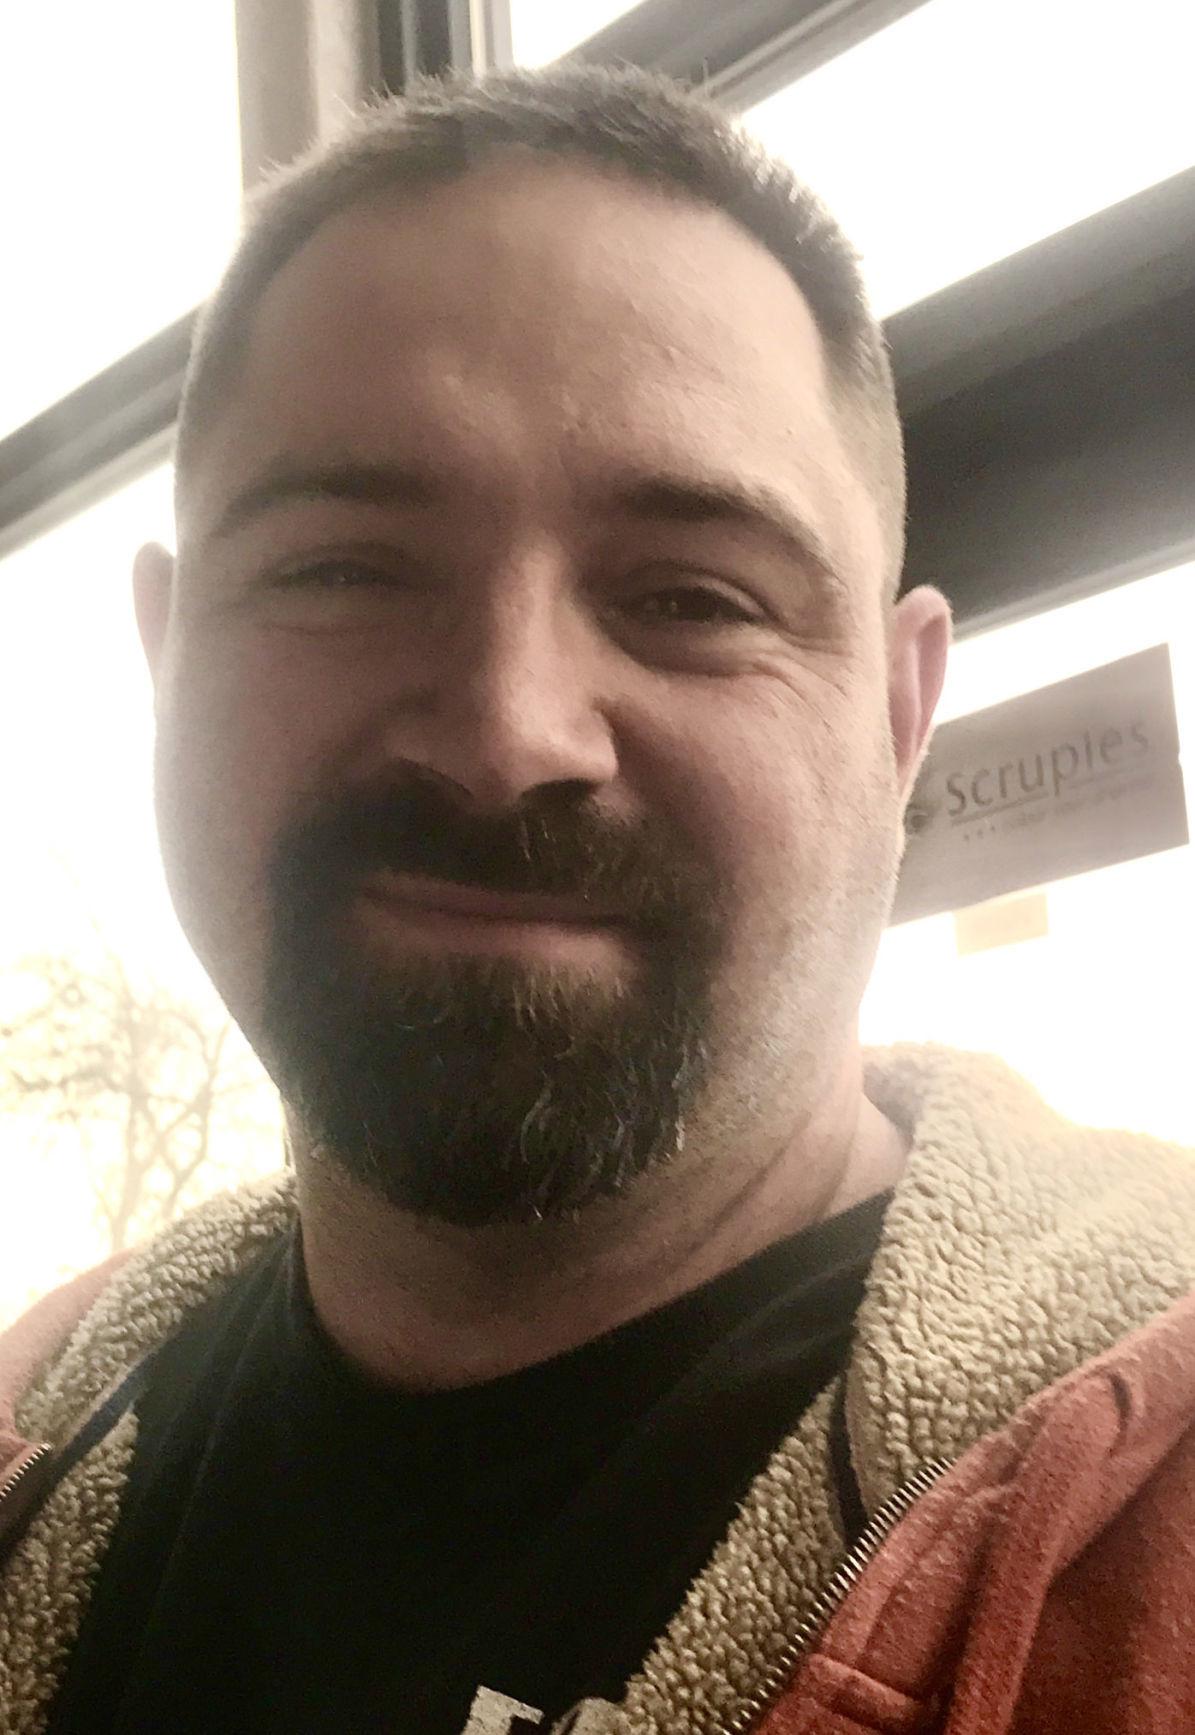 Patrick O'Connell, 37